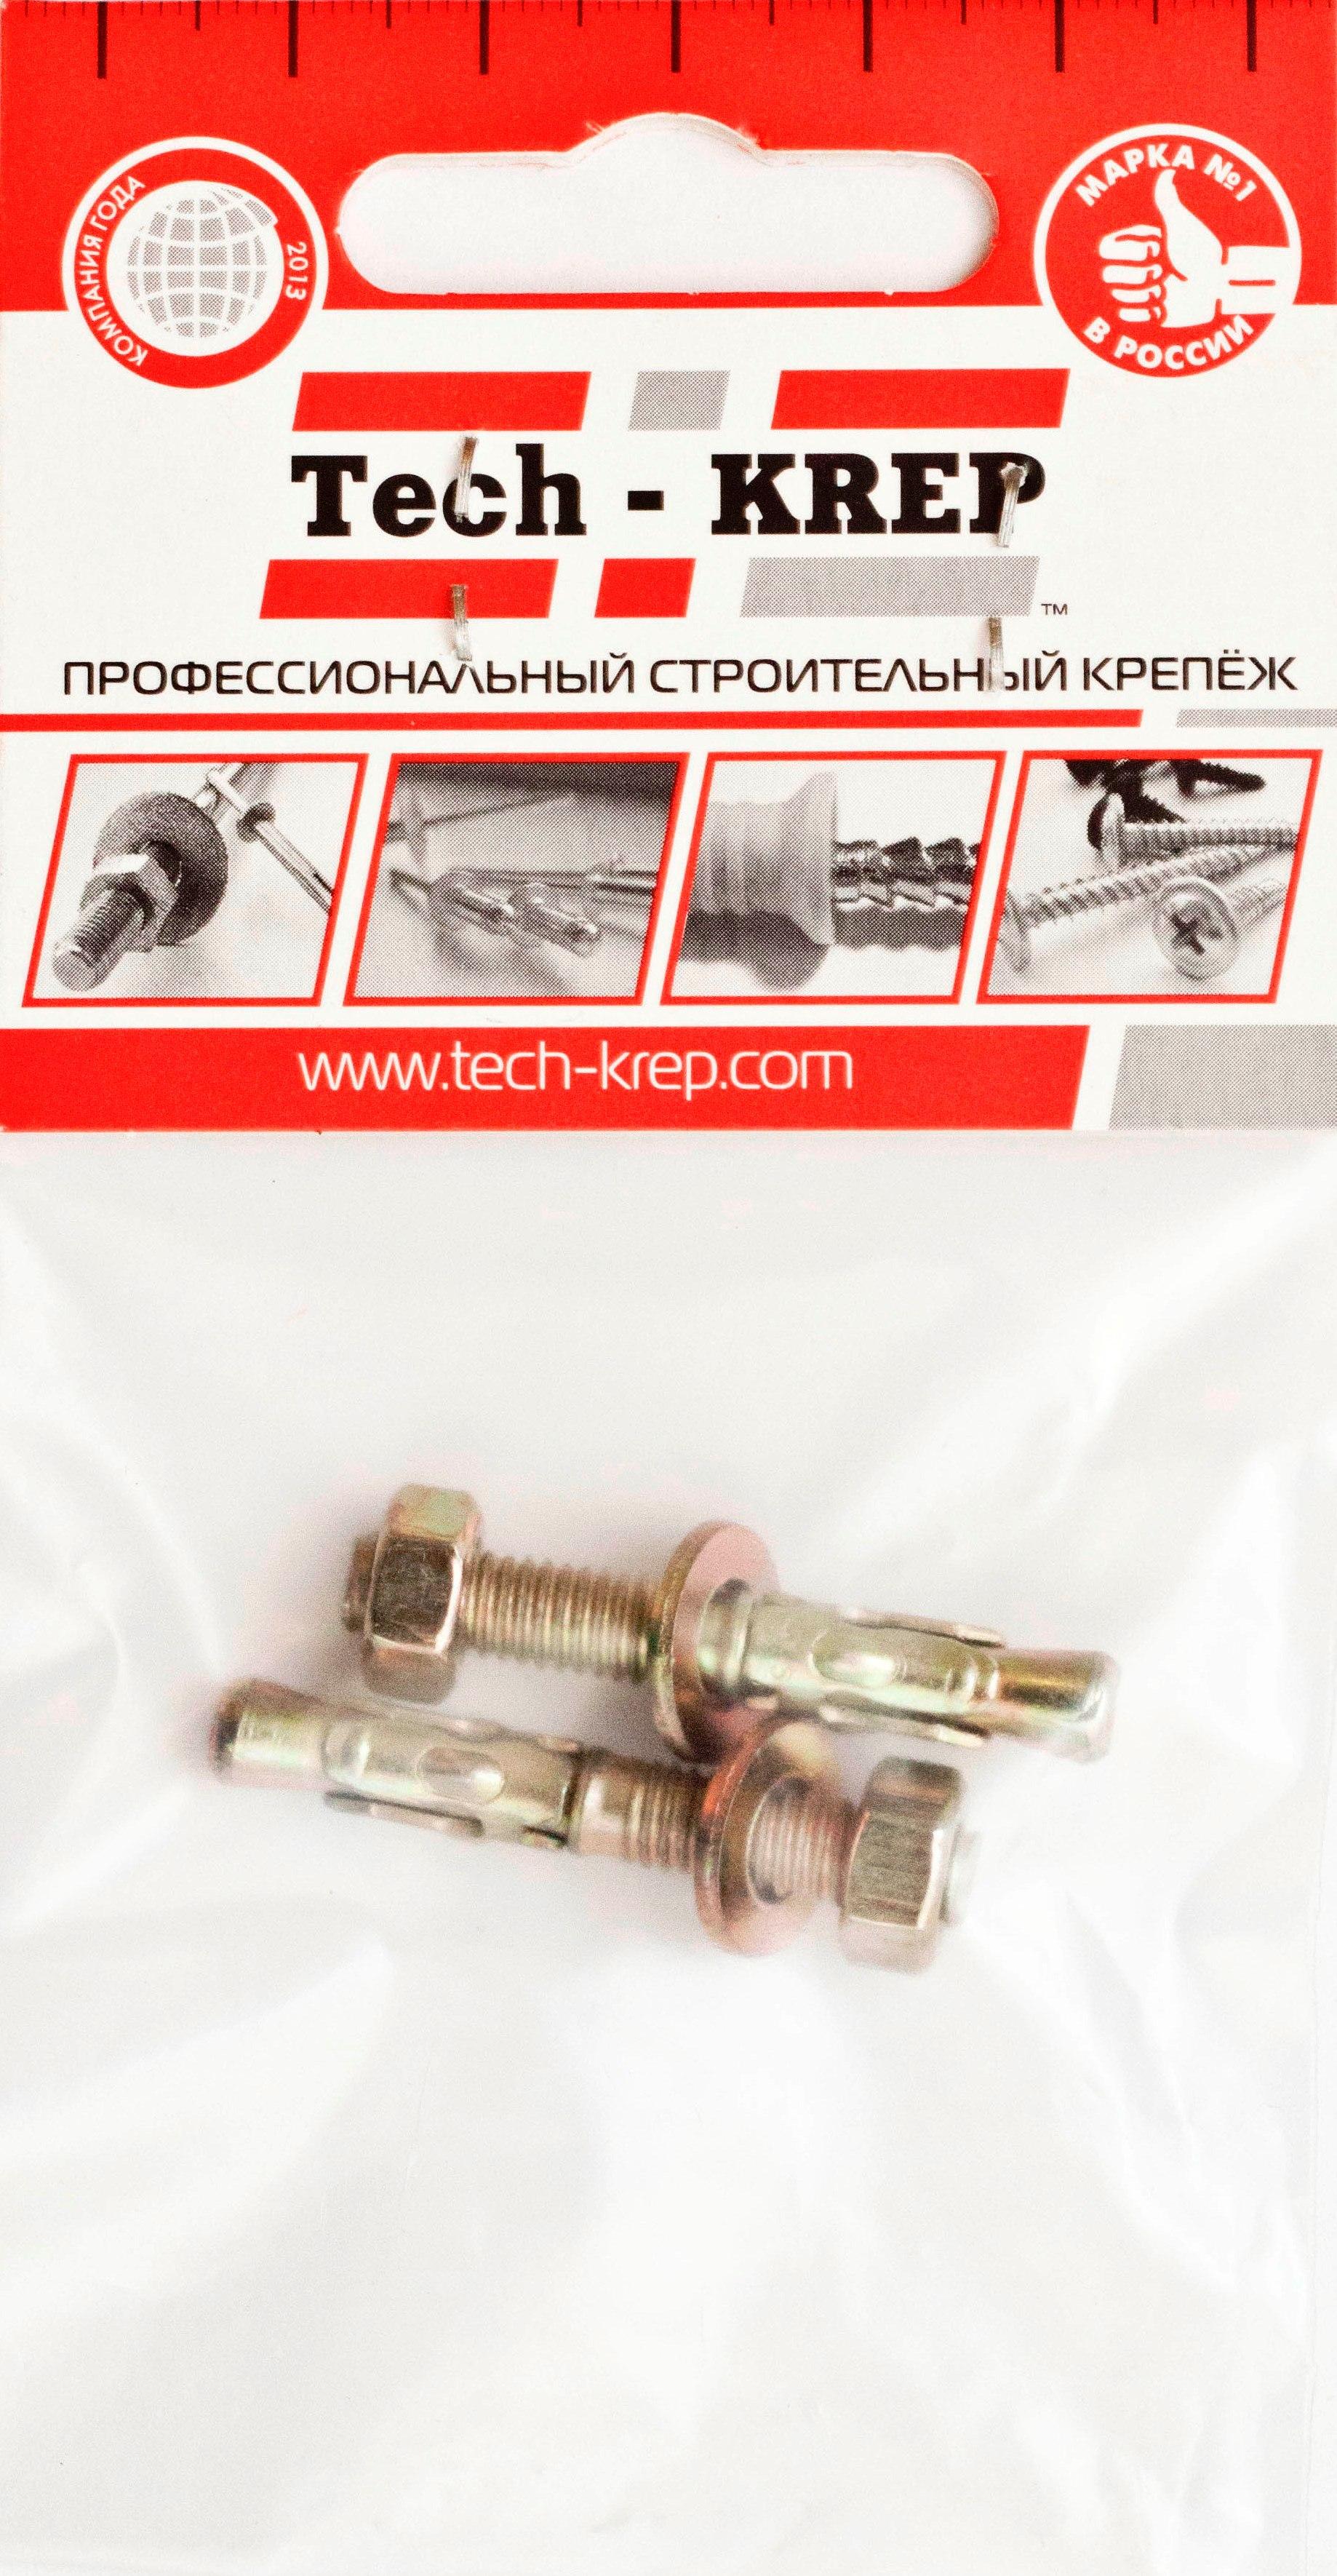 Анкер ТЕХ-КРЕП 104666